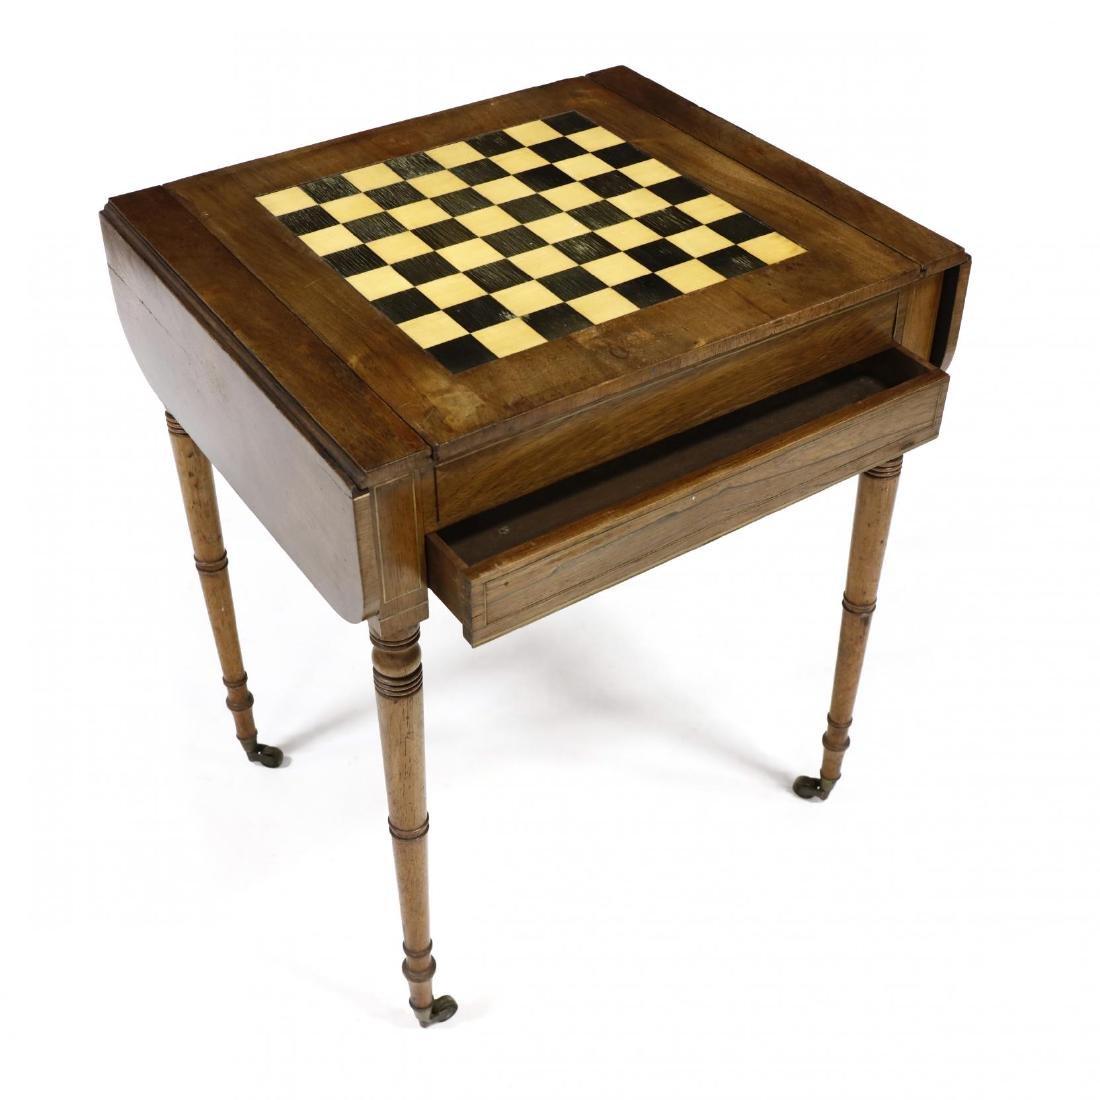 English Regency Game Table - 2